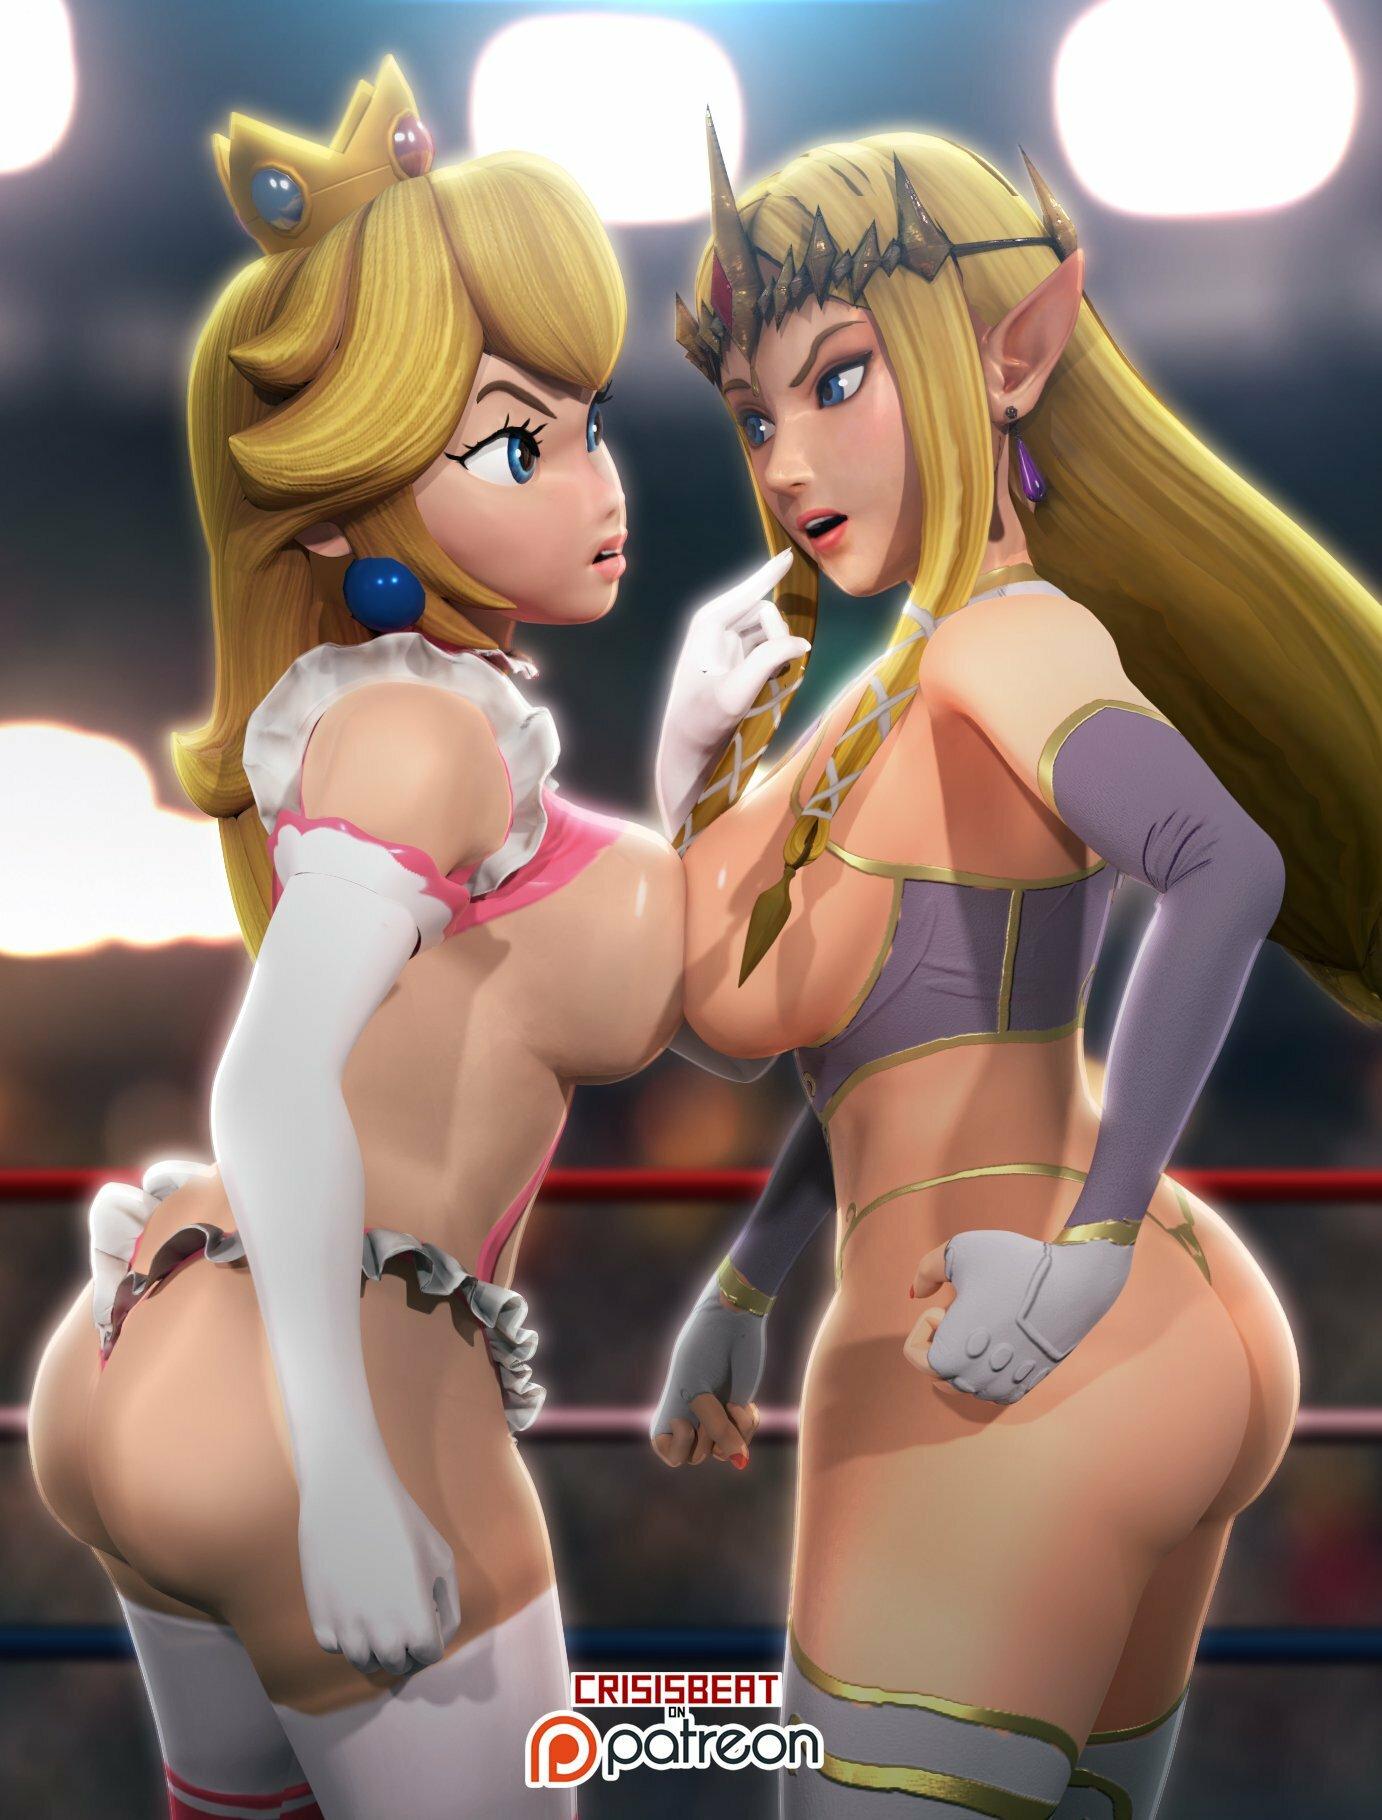 Princess Peach And Zelda D By Crisisbeat On Newgrounds